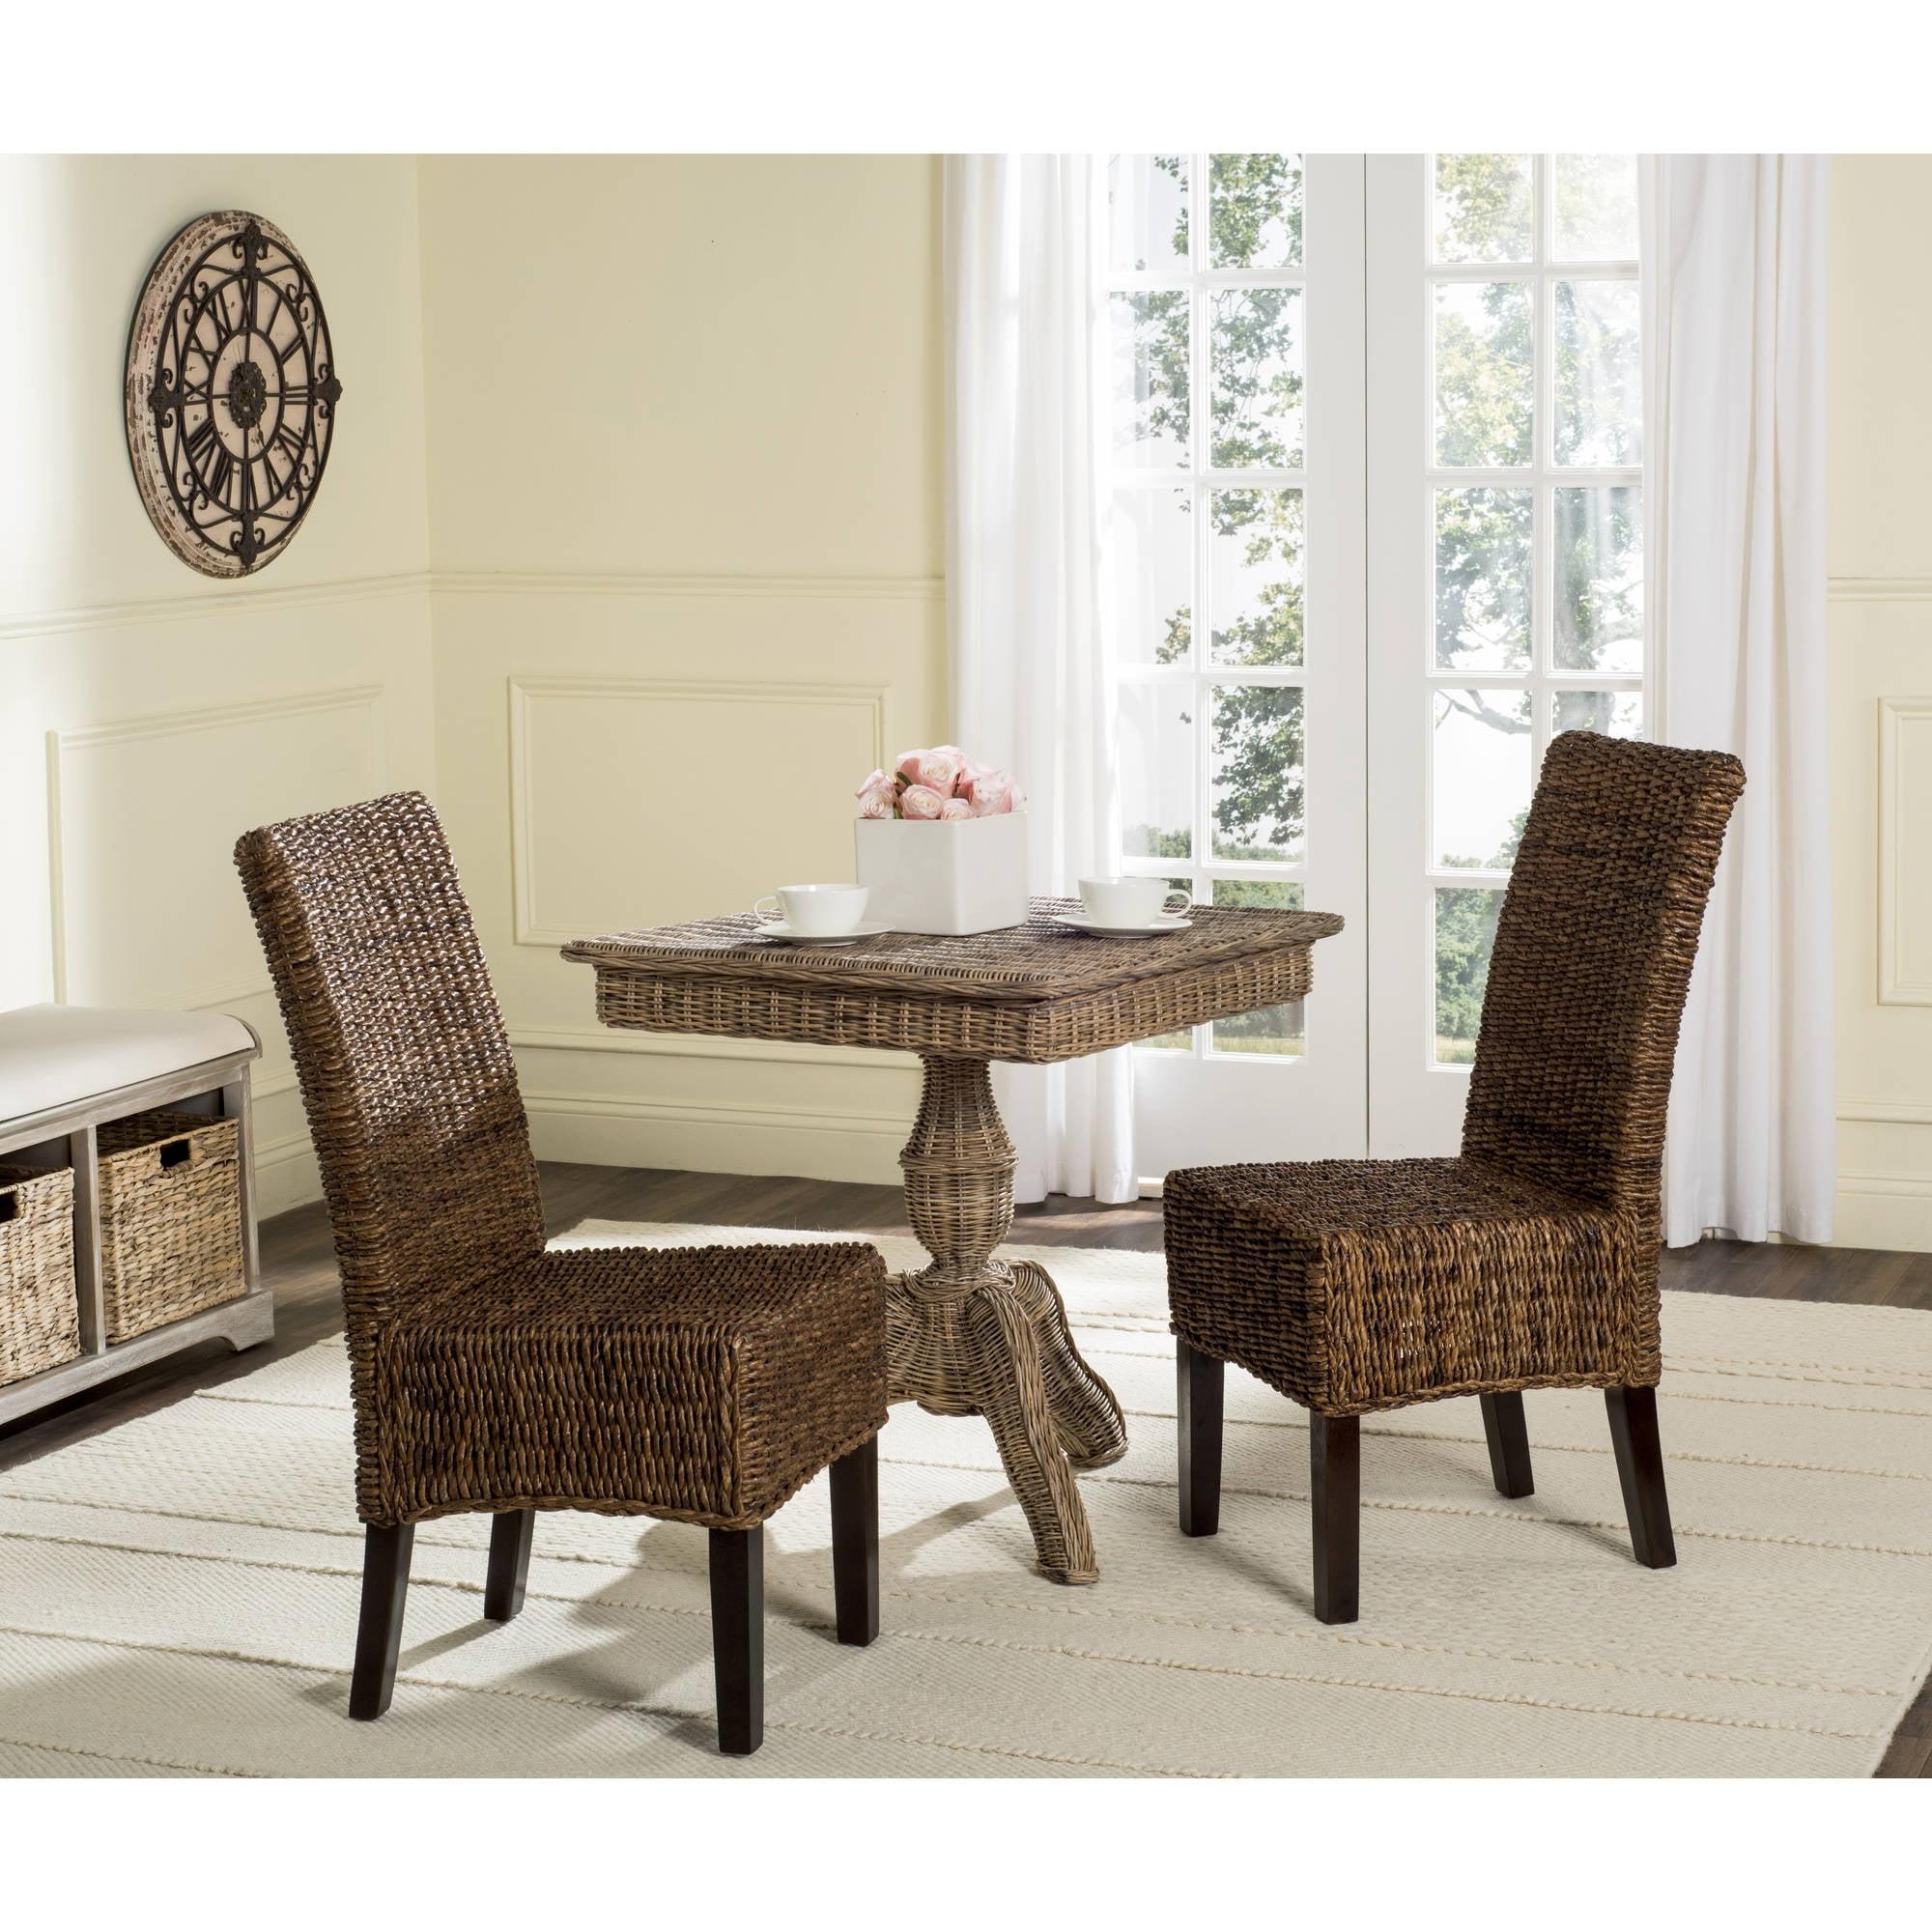 "Safavieh Avita 18"" High Wicker Dining Chair, Multiple Colors Set of 2 by Safavieh"